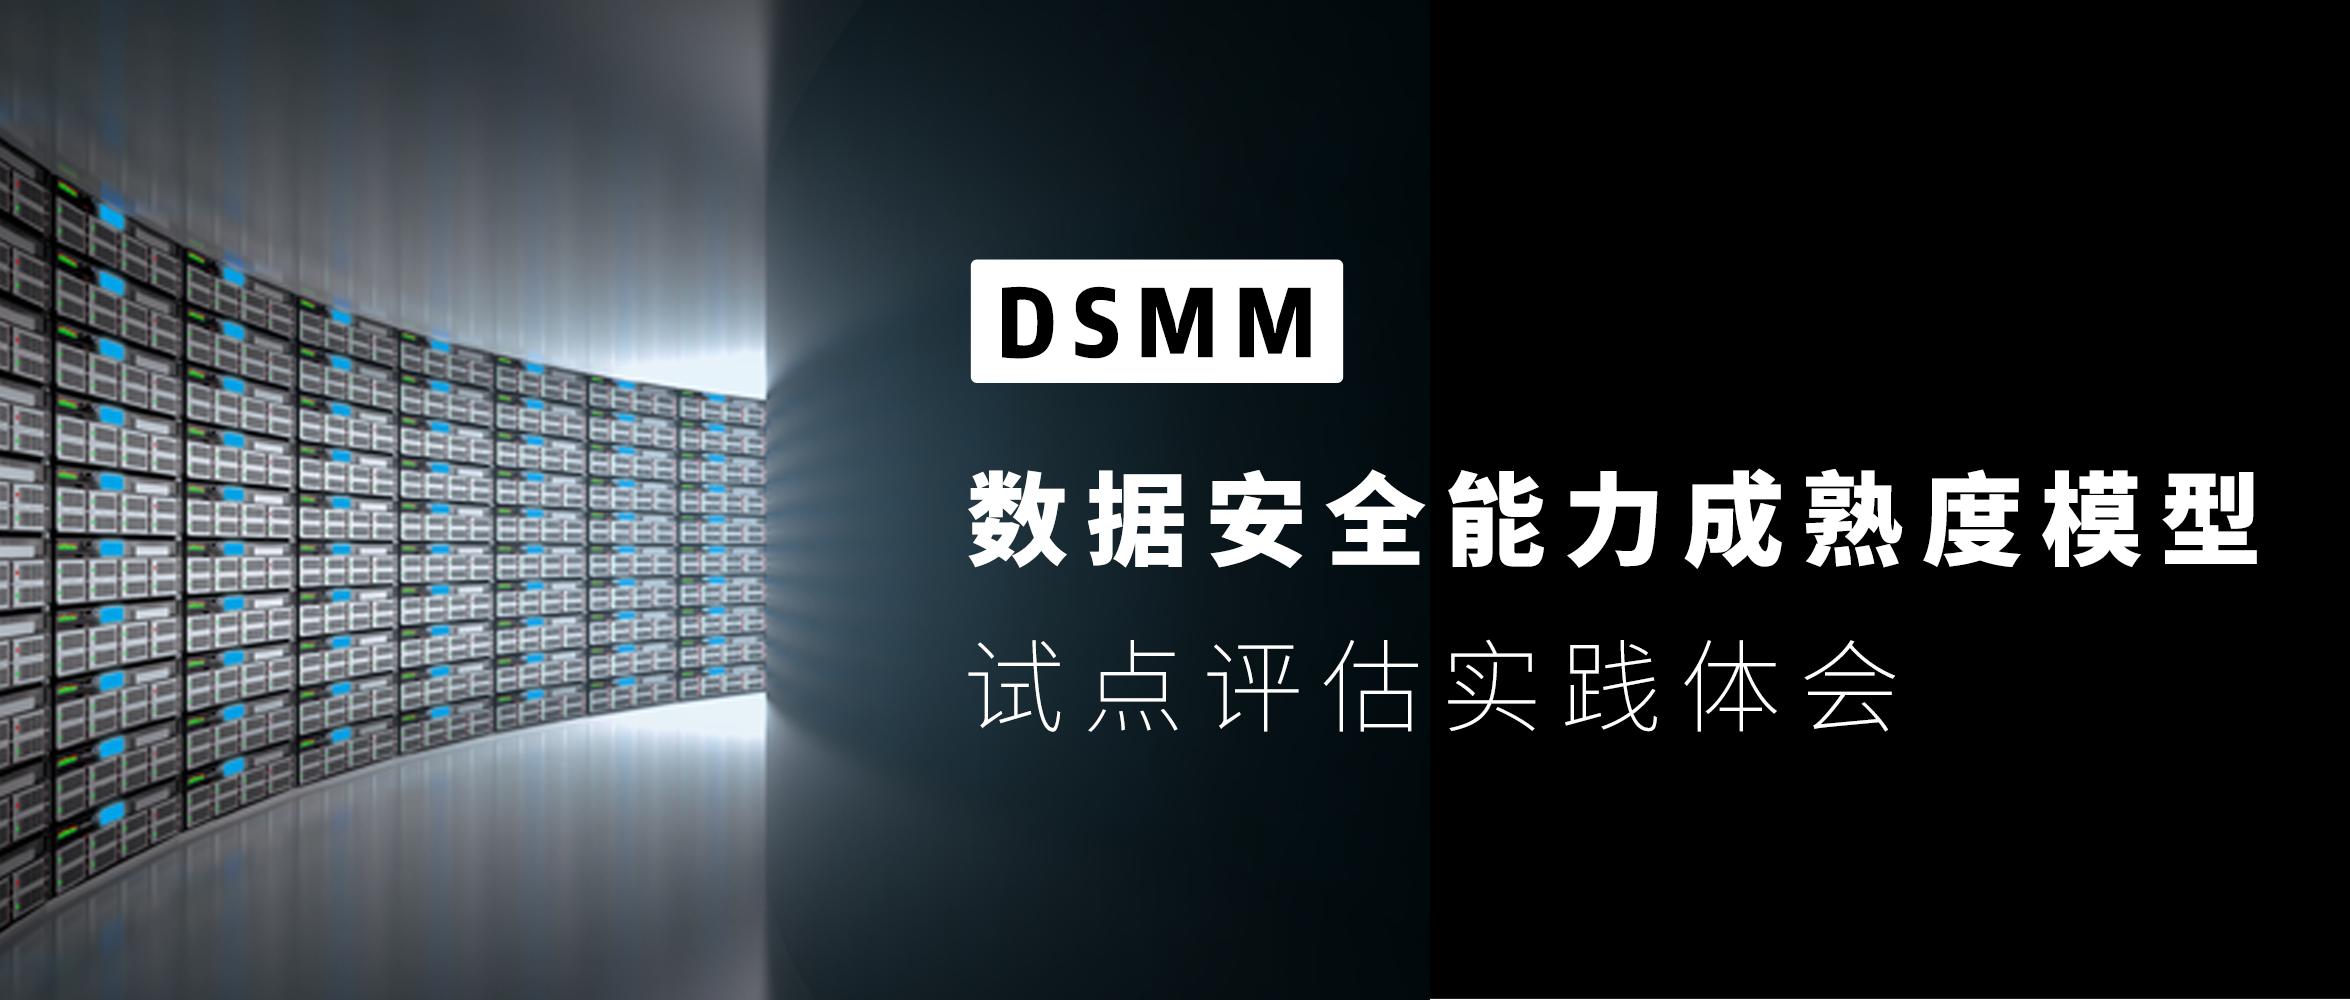 DSMM数据安全能力成熟度模型试点评估-互联网之家